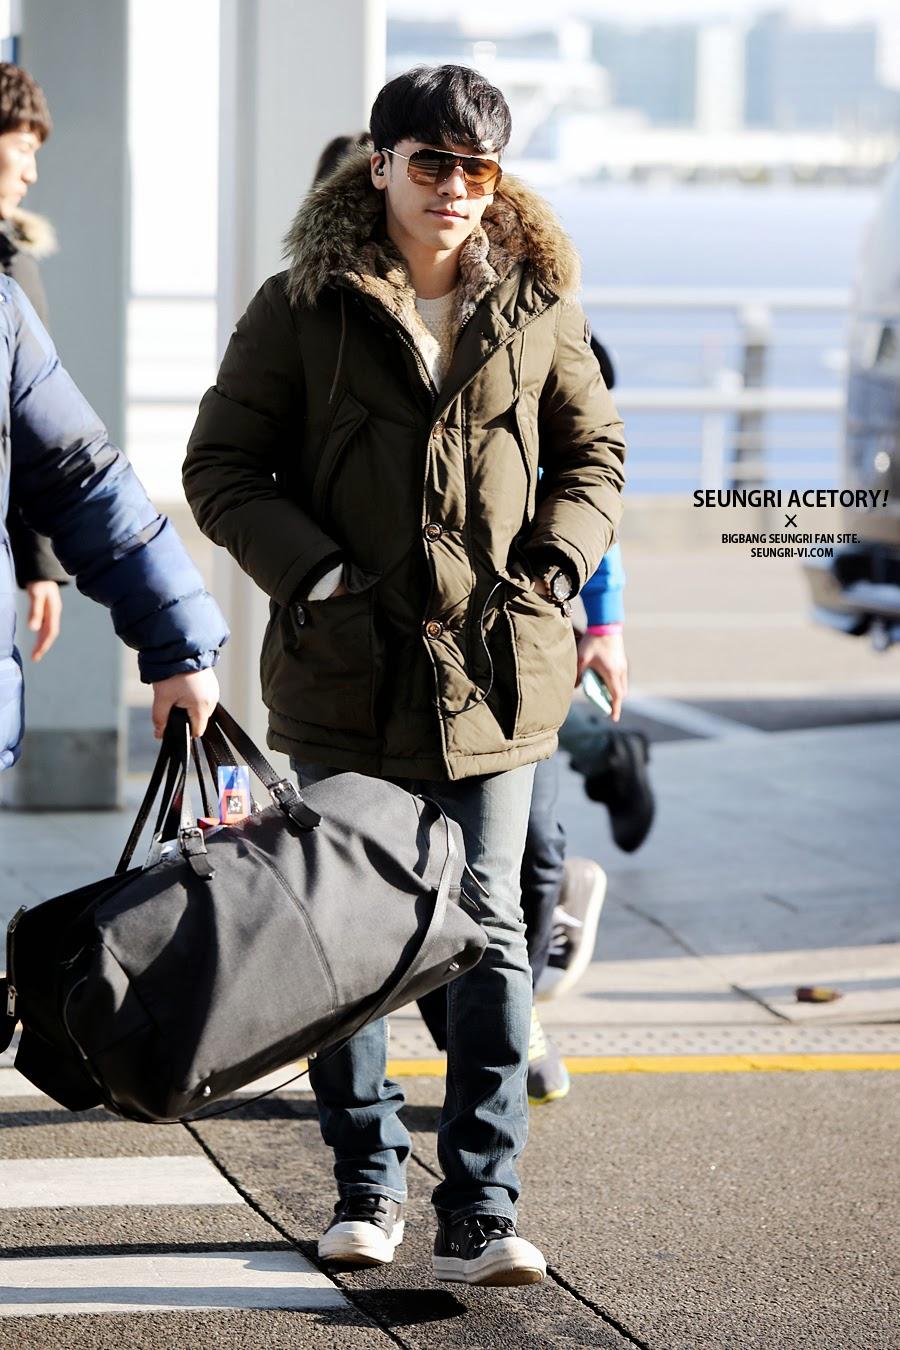 Big Bang - Incheon Airport - 13dec2013 - Seung Ri - Fan - Acetory - 04.JPG